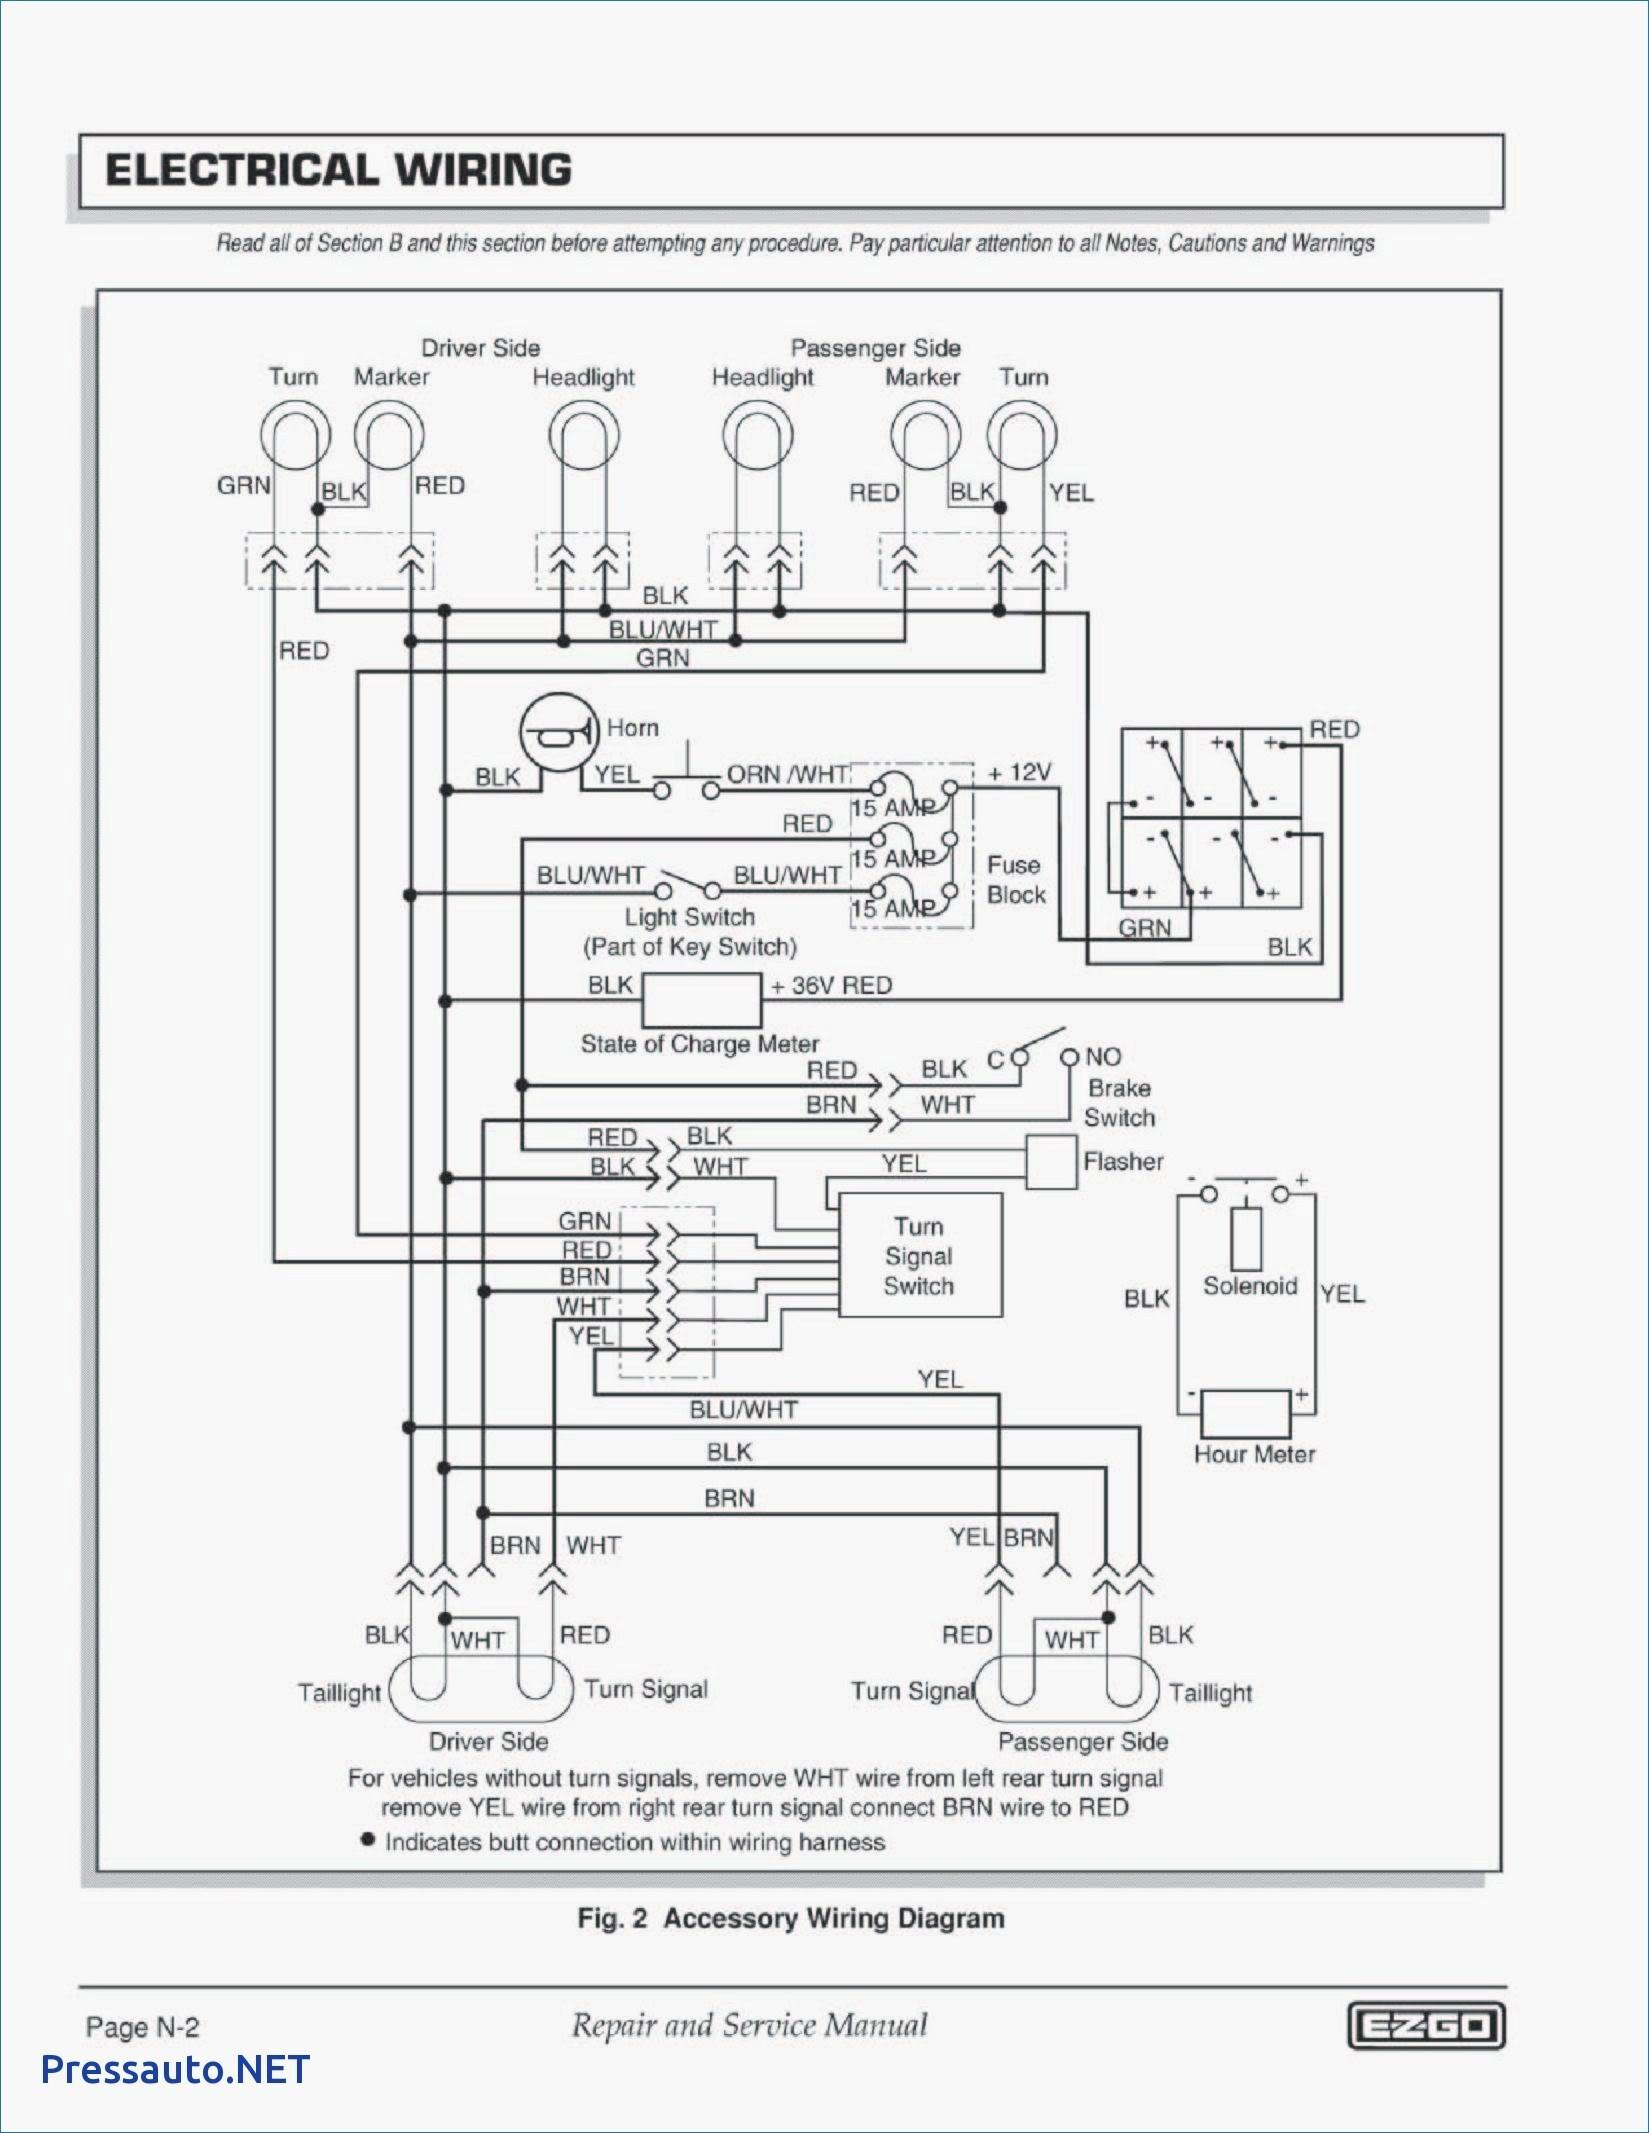 Ez Wiring Harness Manual | Wiring DiagramBege Wiring Diagram